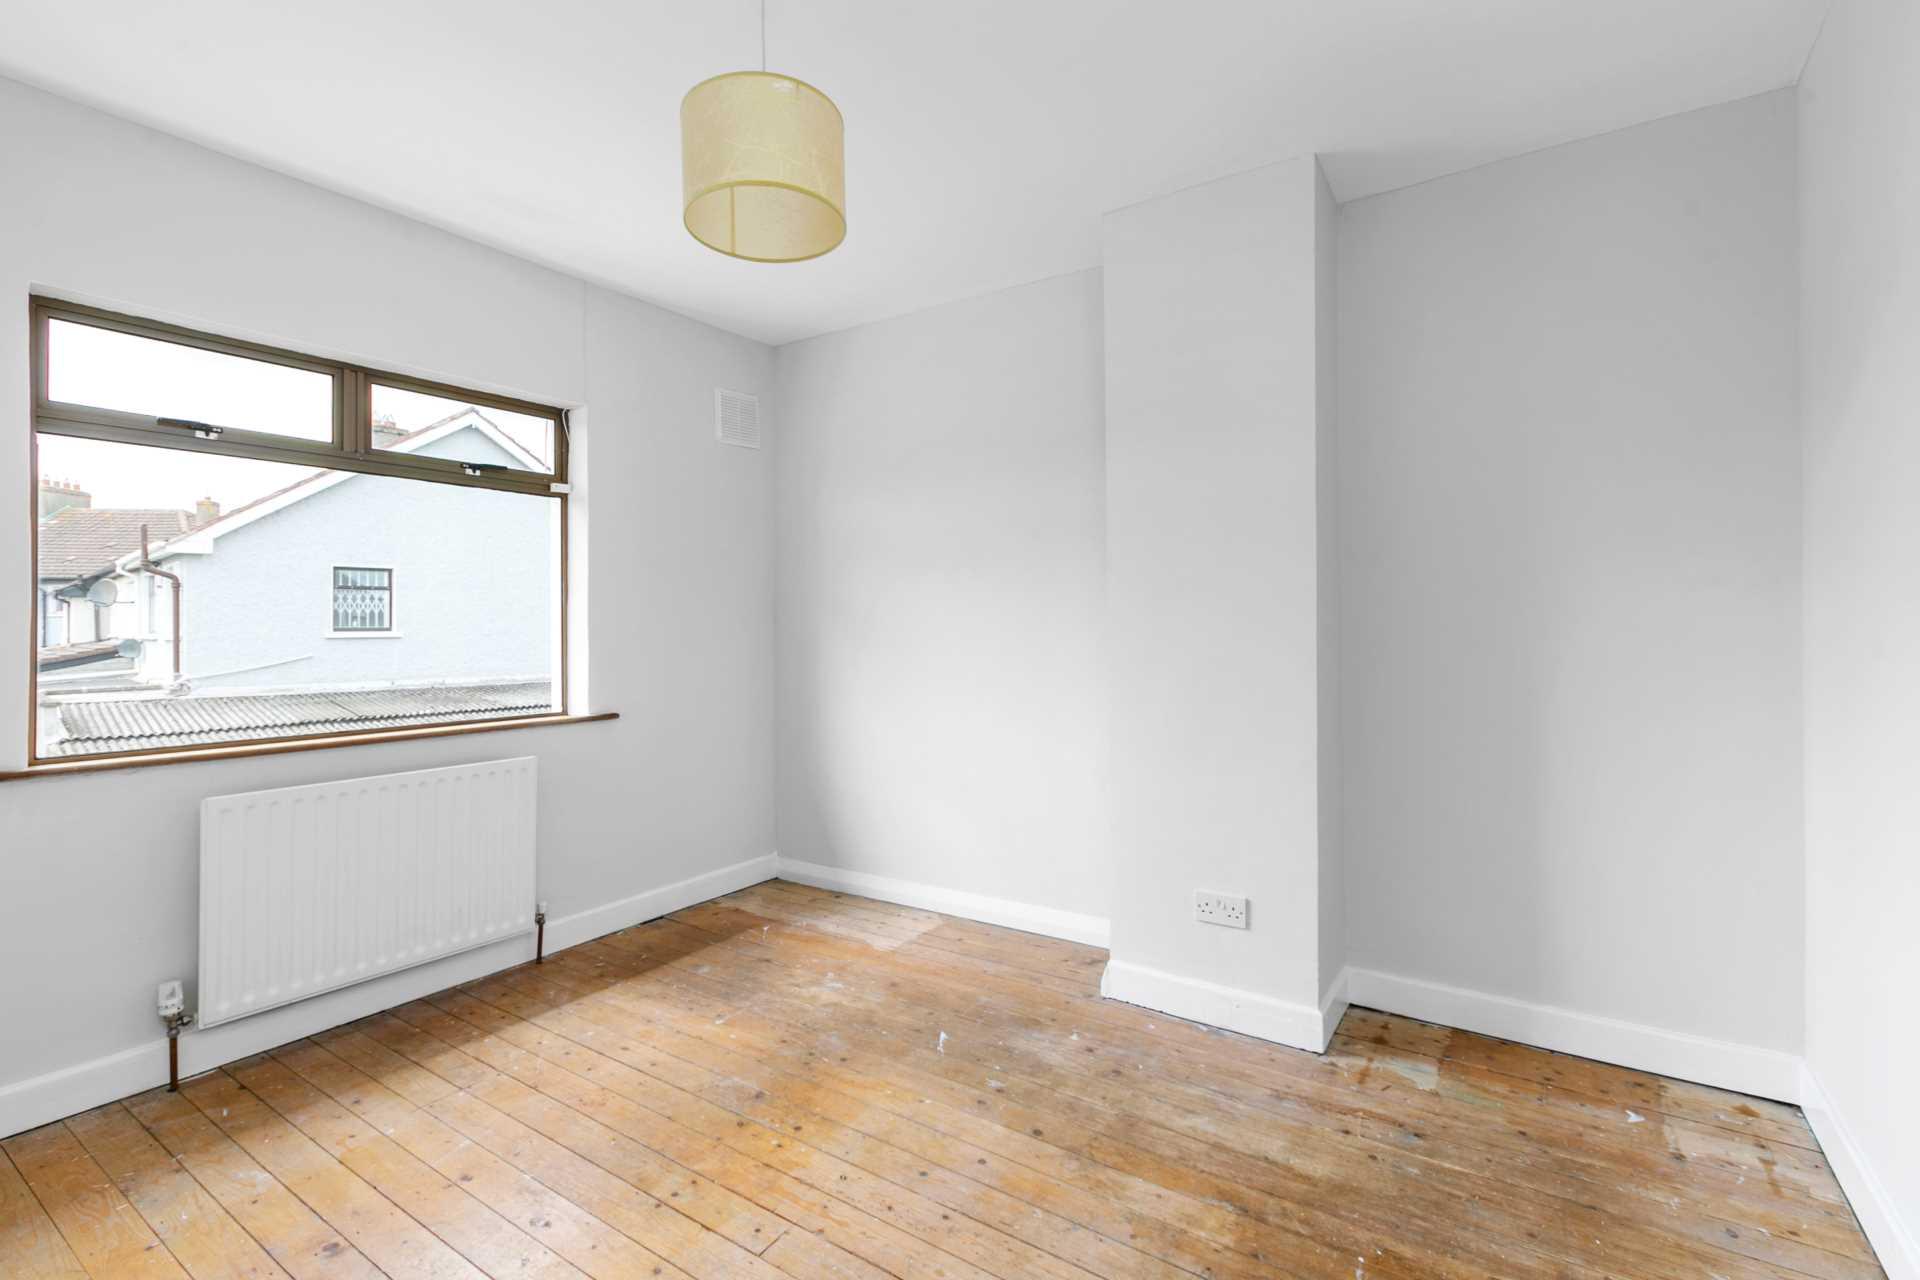 157 Whitehall Road West, Manor Estate, Terenure, Dublin 12, Image 10